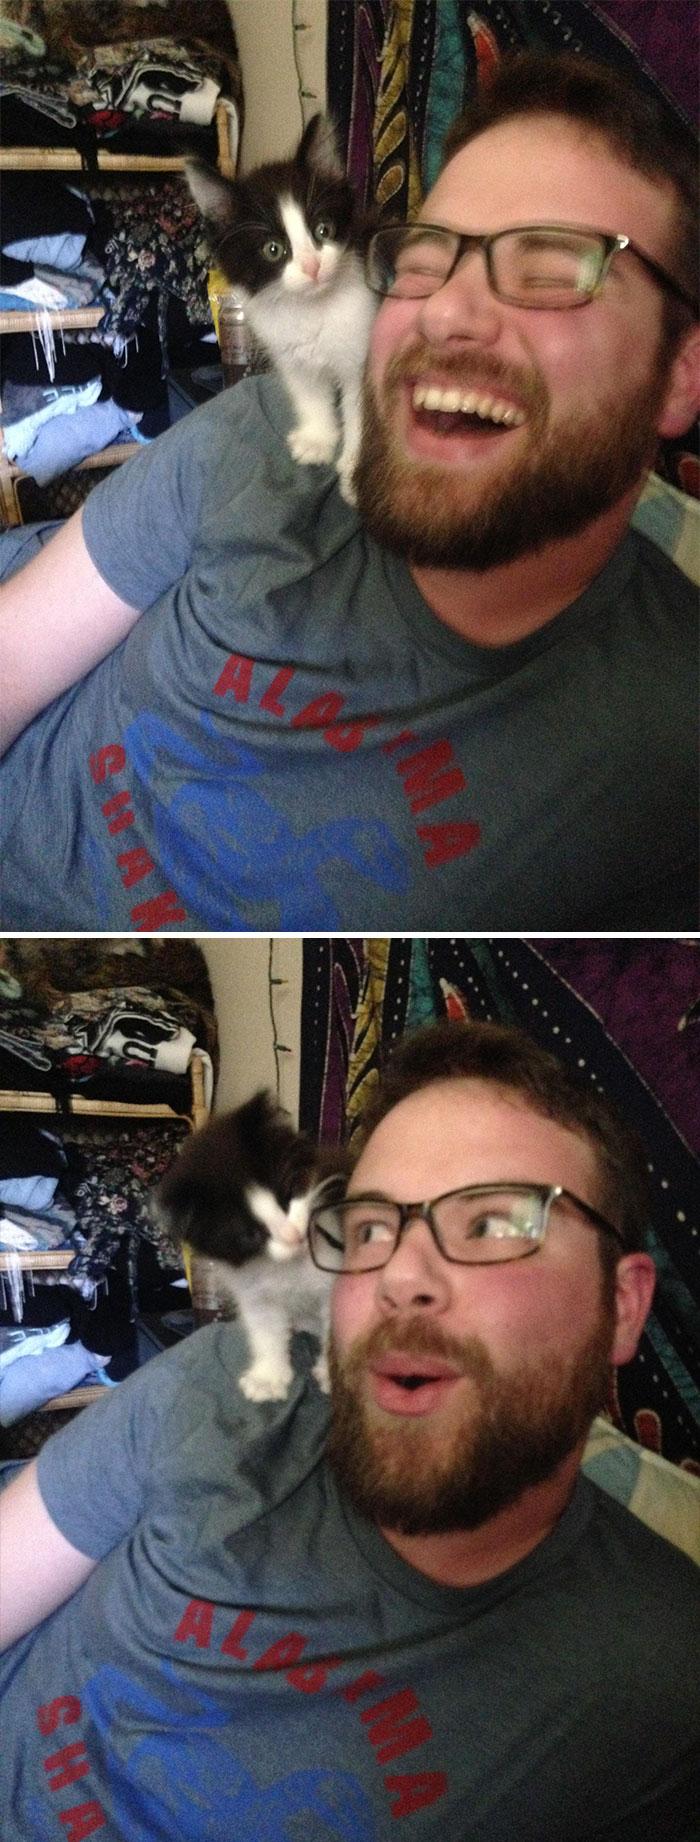 My Boyfriend Said He Doesn't Like Cats